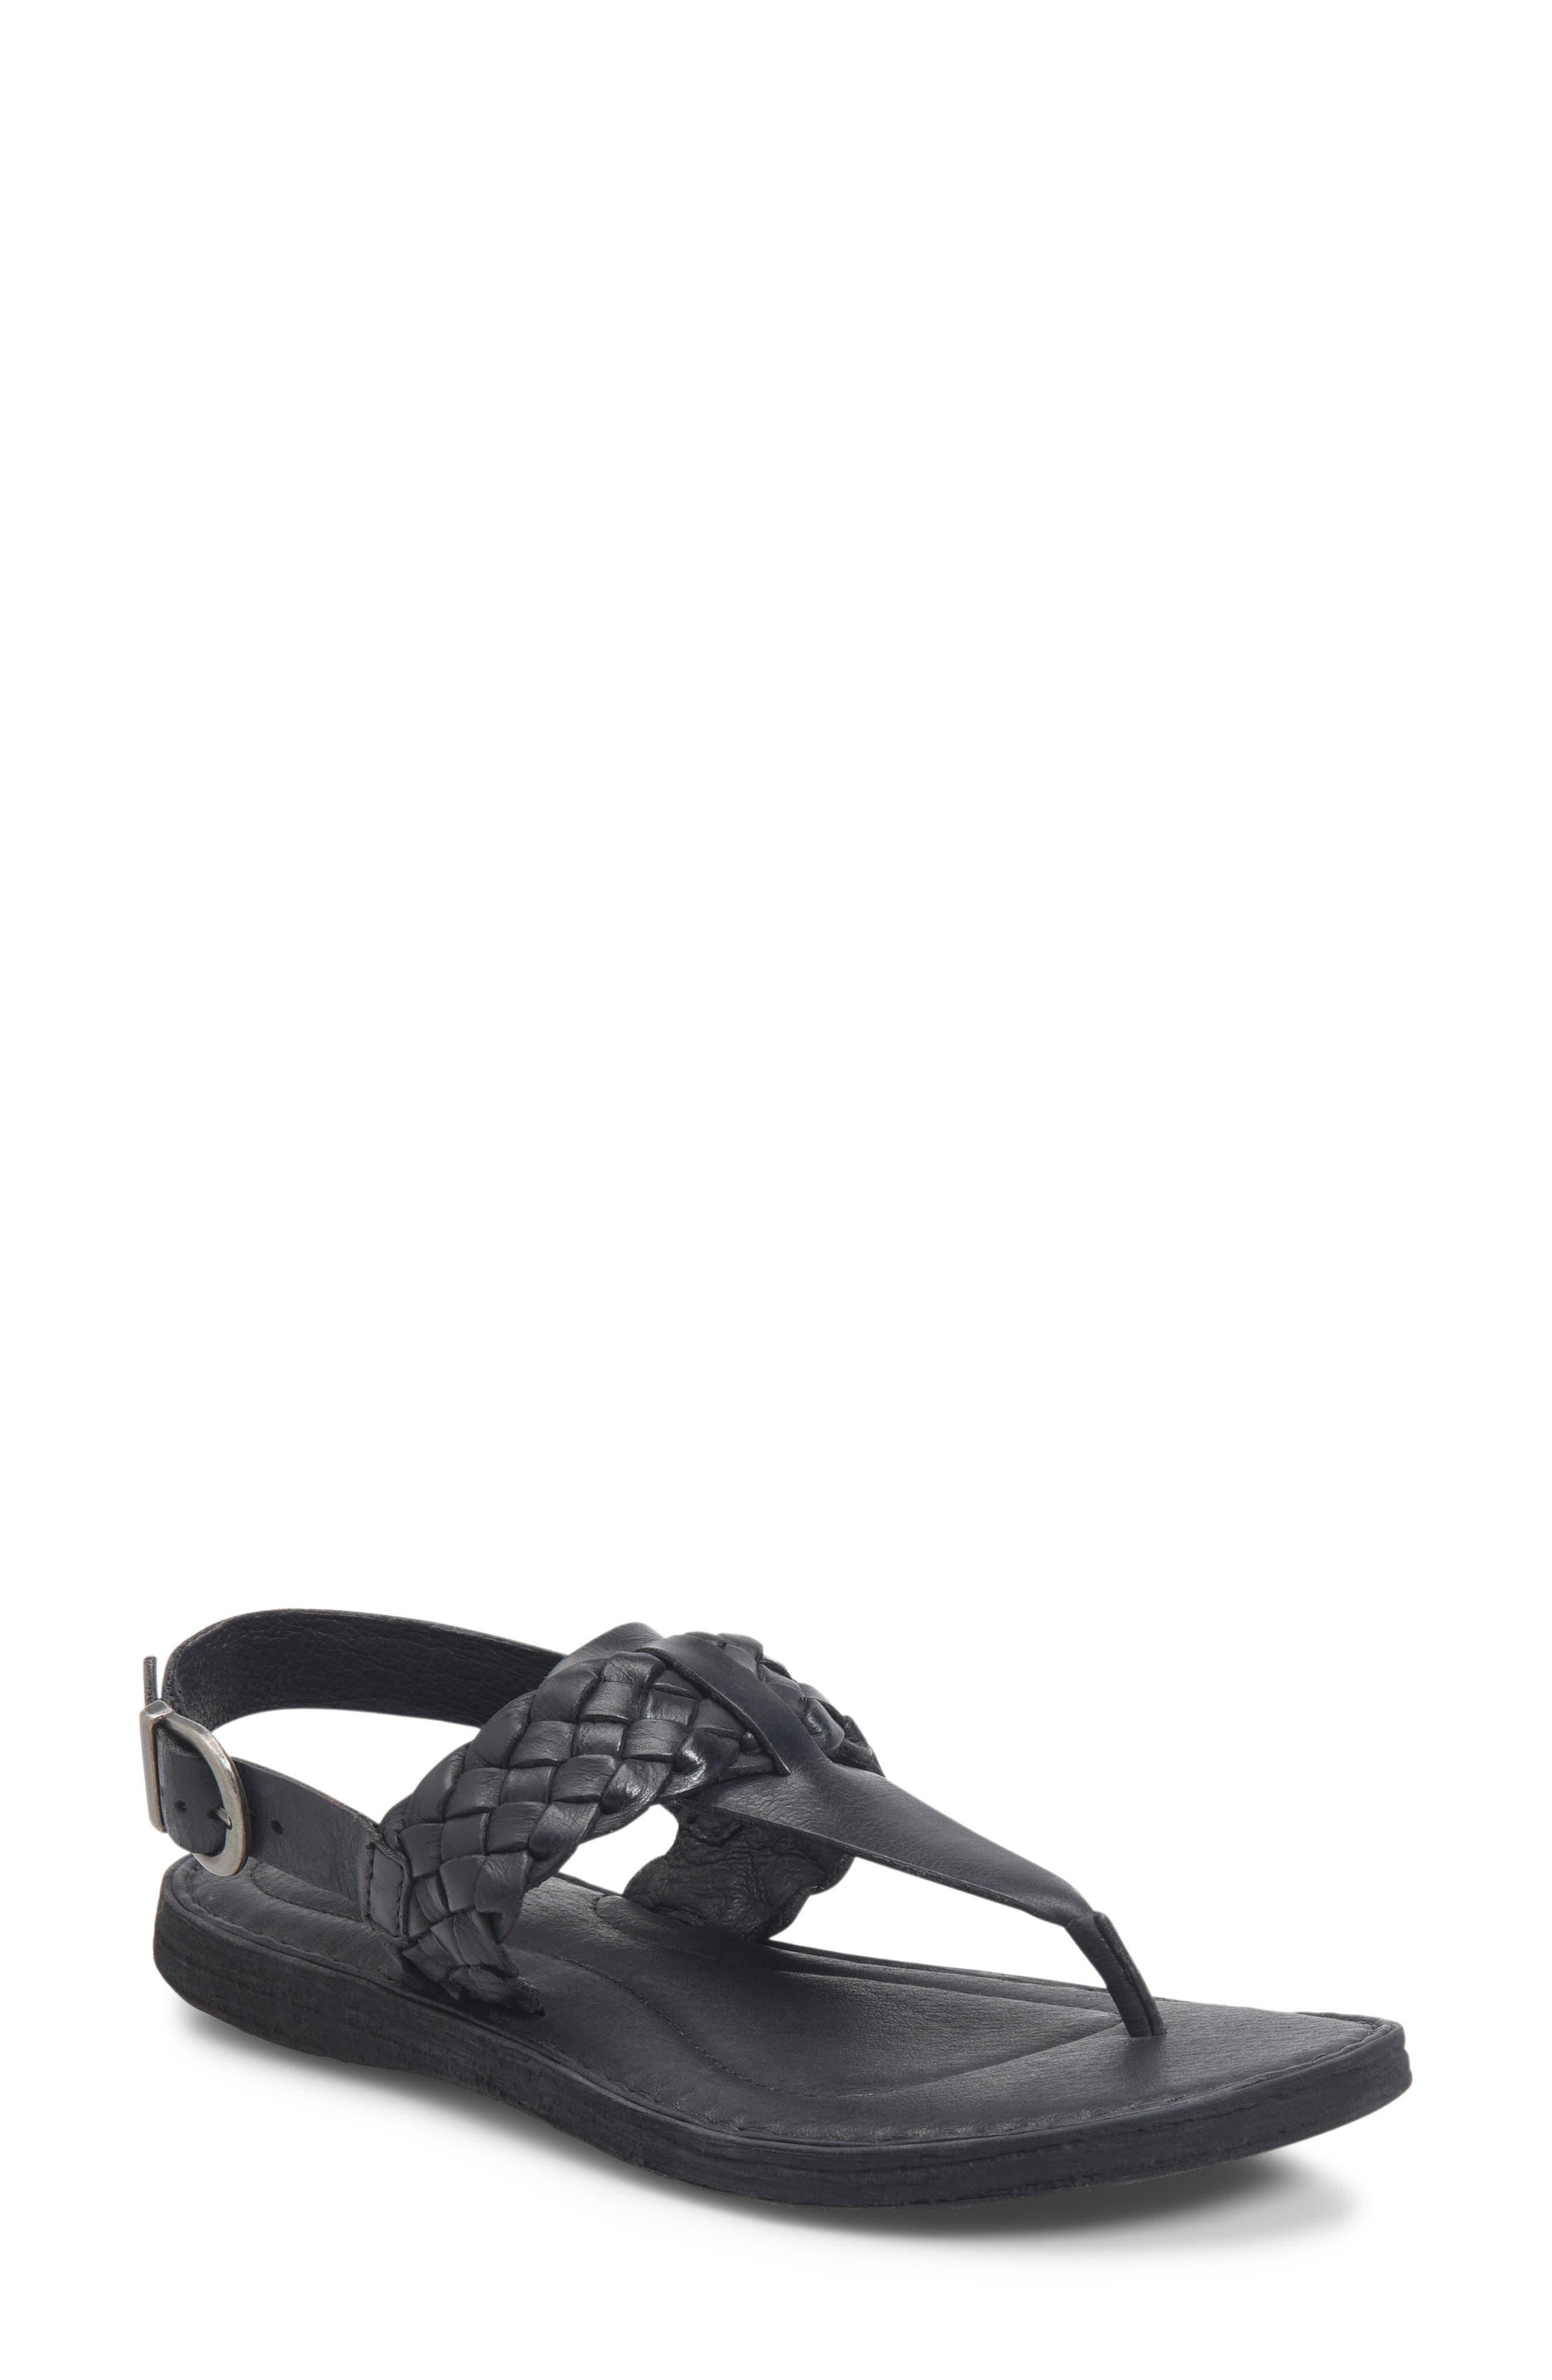 B?rn Sumter Braided Sandal, Black